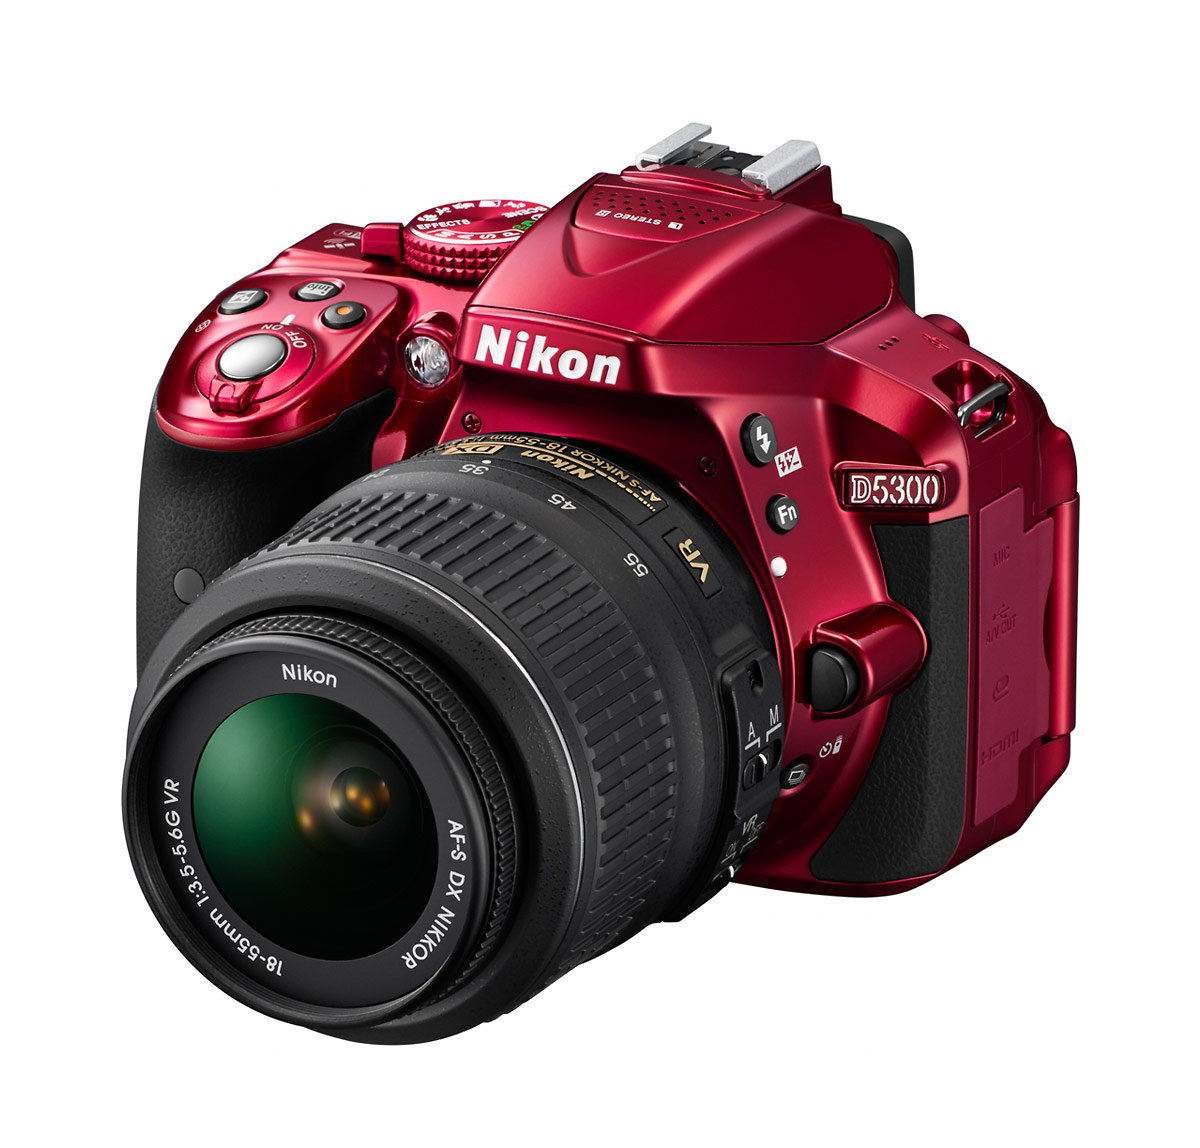 Nikon D5300 24-Megapixel DSLR - Red